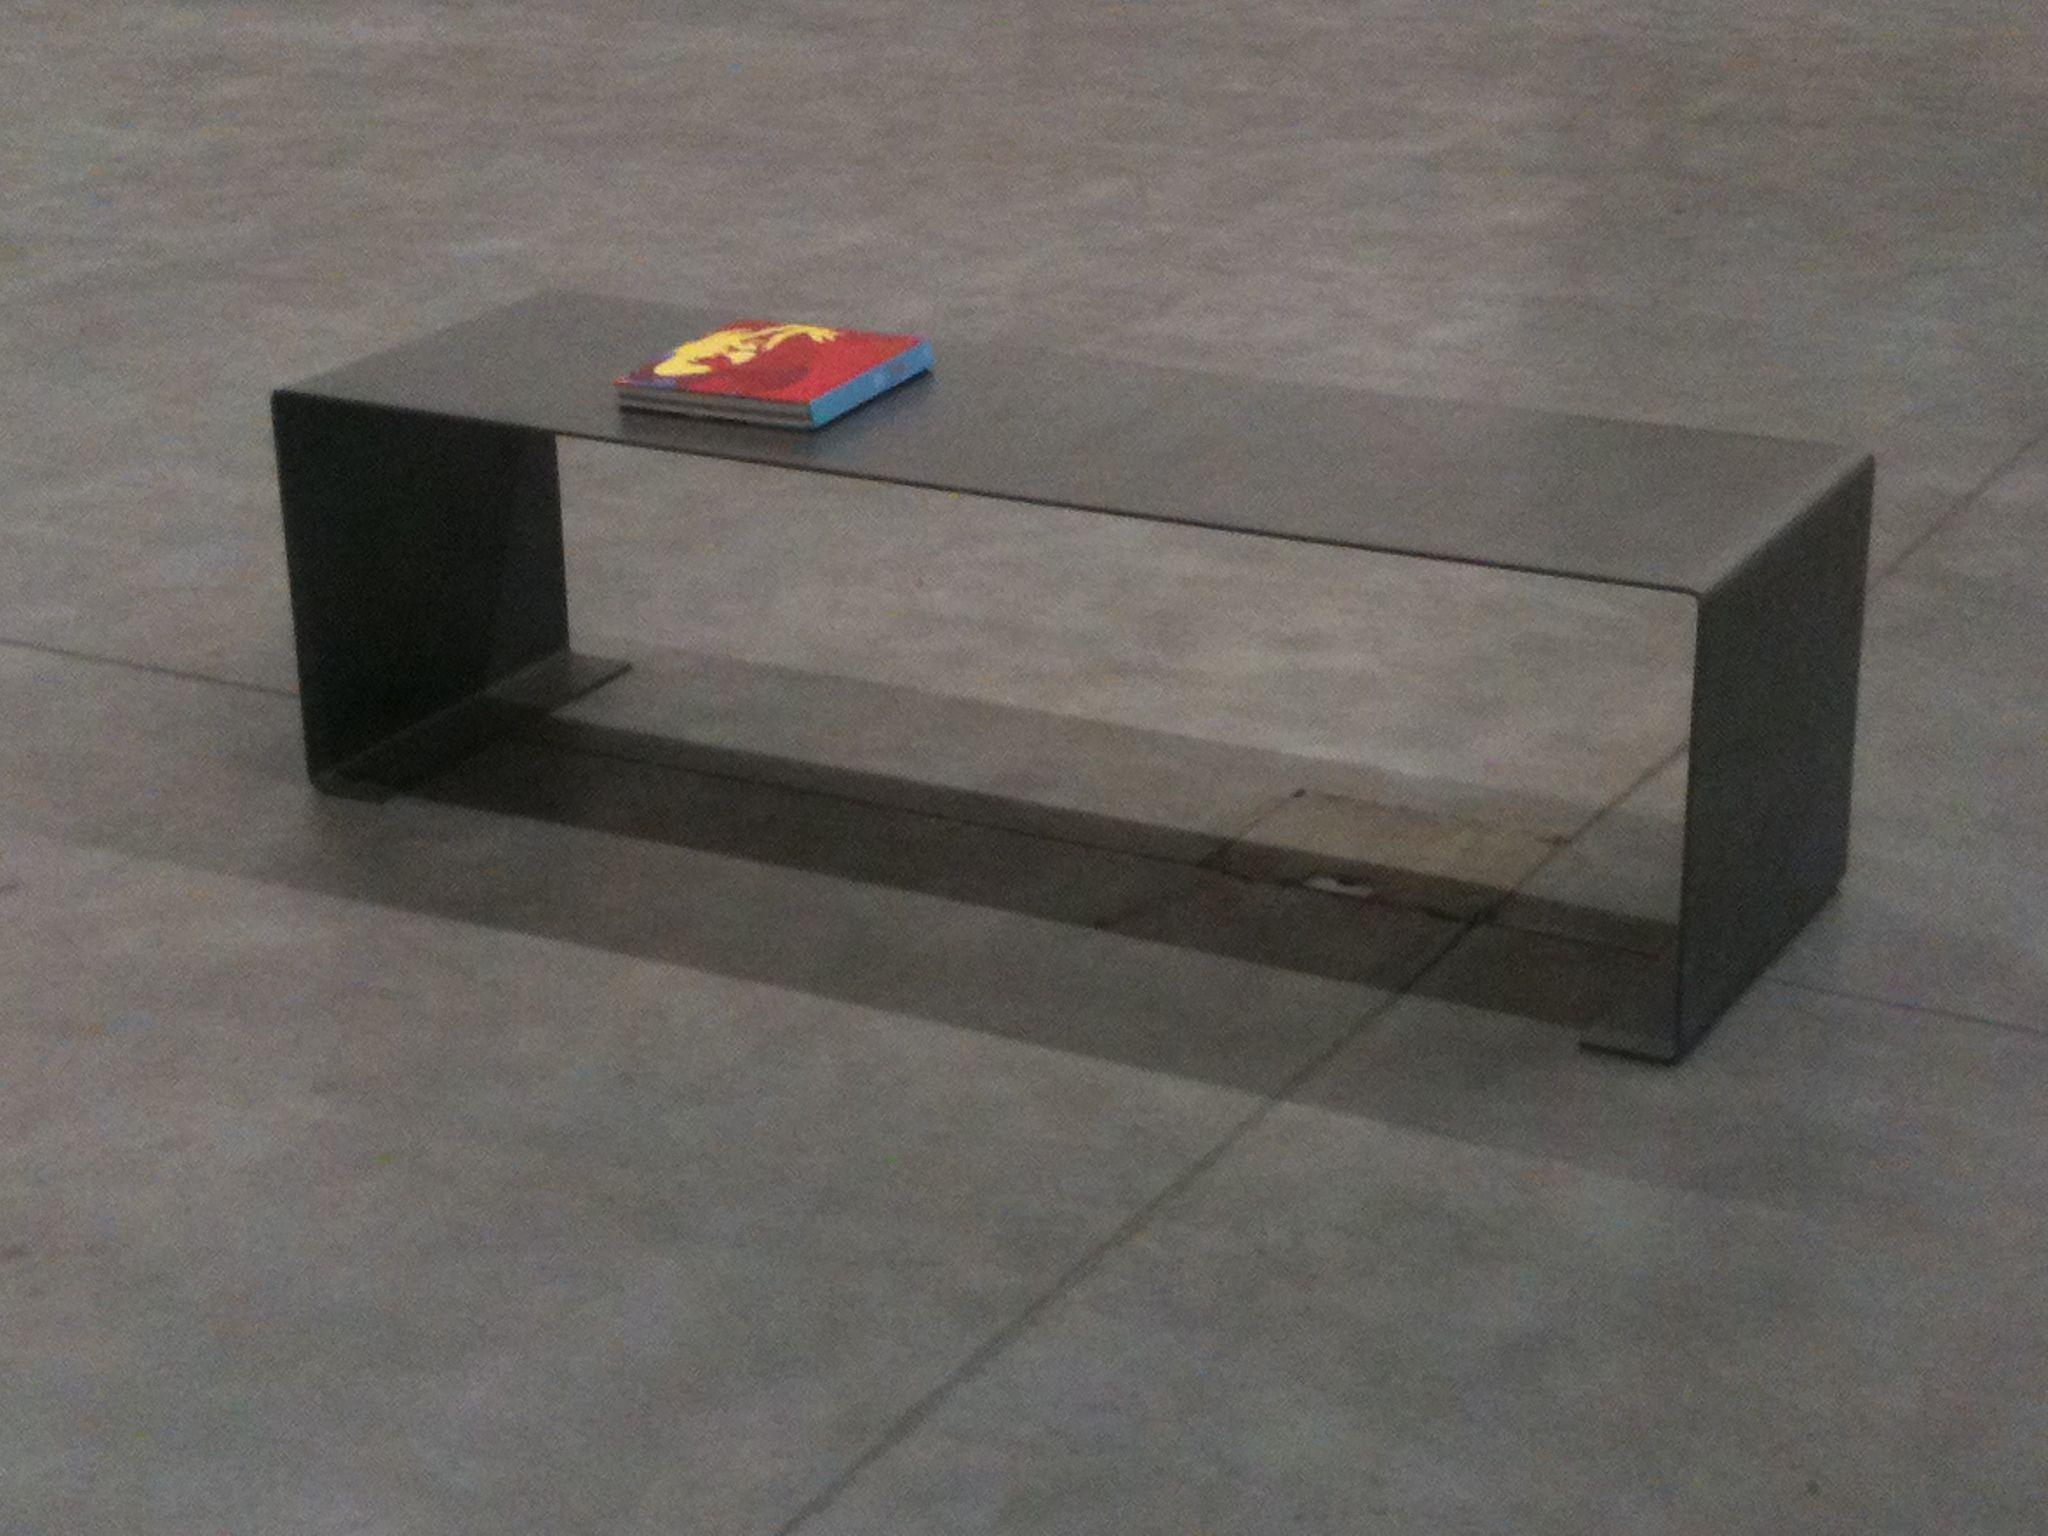 636ae532f73fbfa2161dc9494ee929da Incroyable De Table Basse Le Corbusier Concept